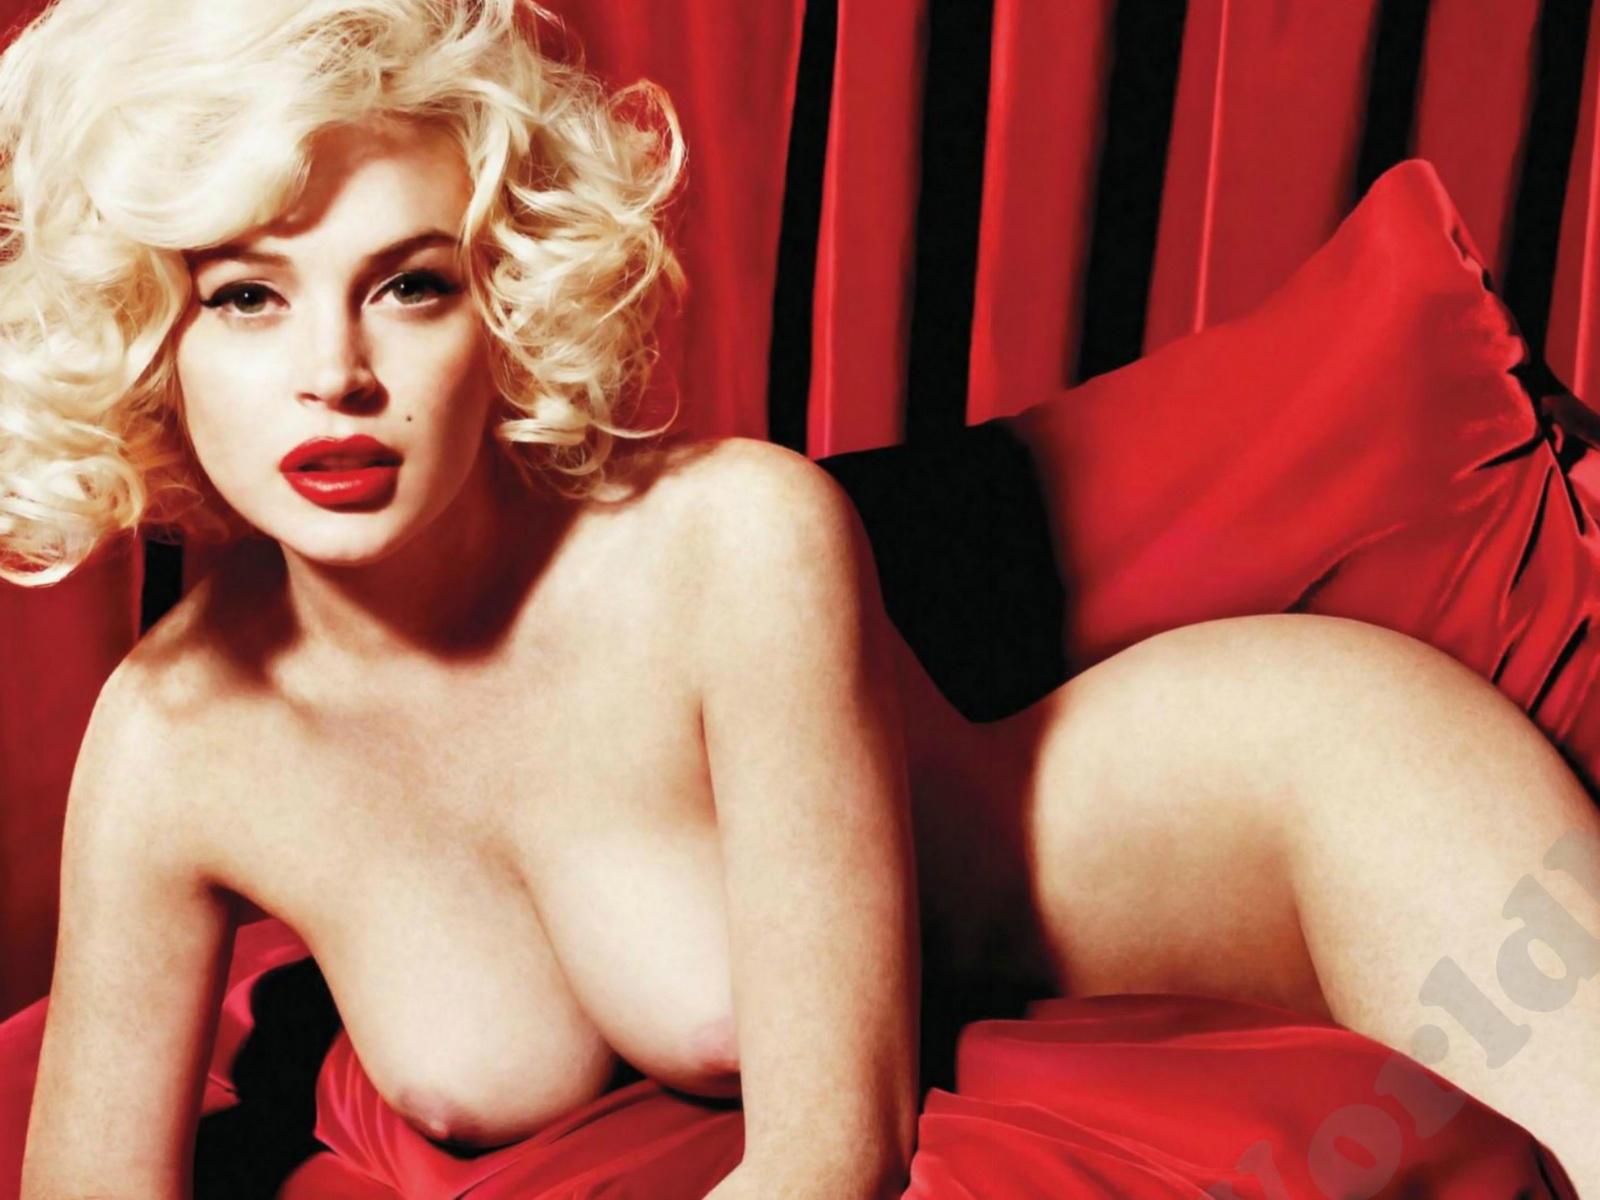 Beauty Celebrity Lindsay Lohan Naked Playboy Magazine -7657